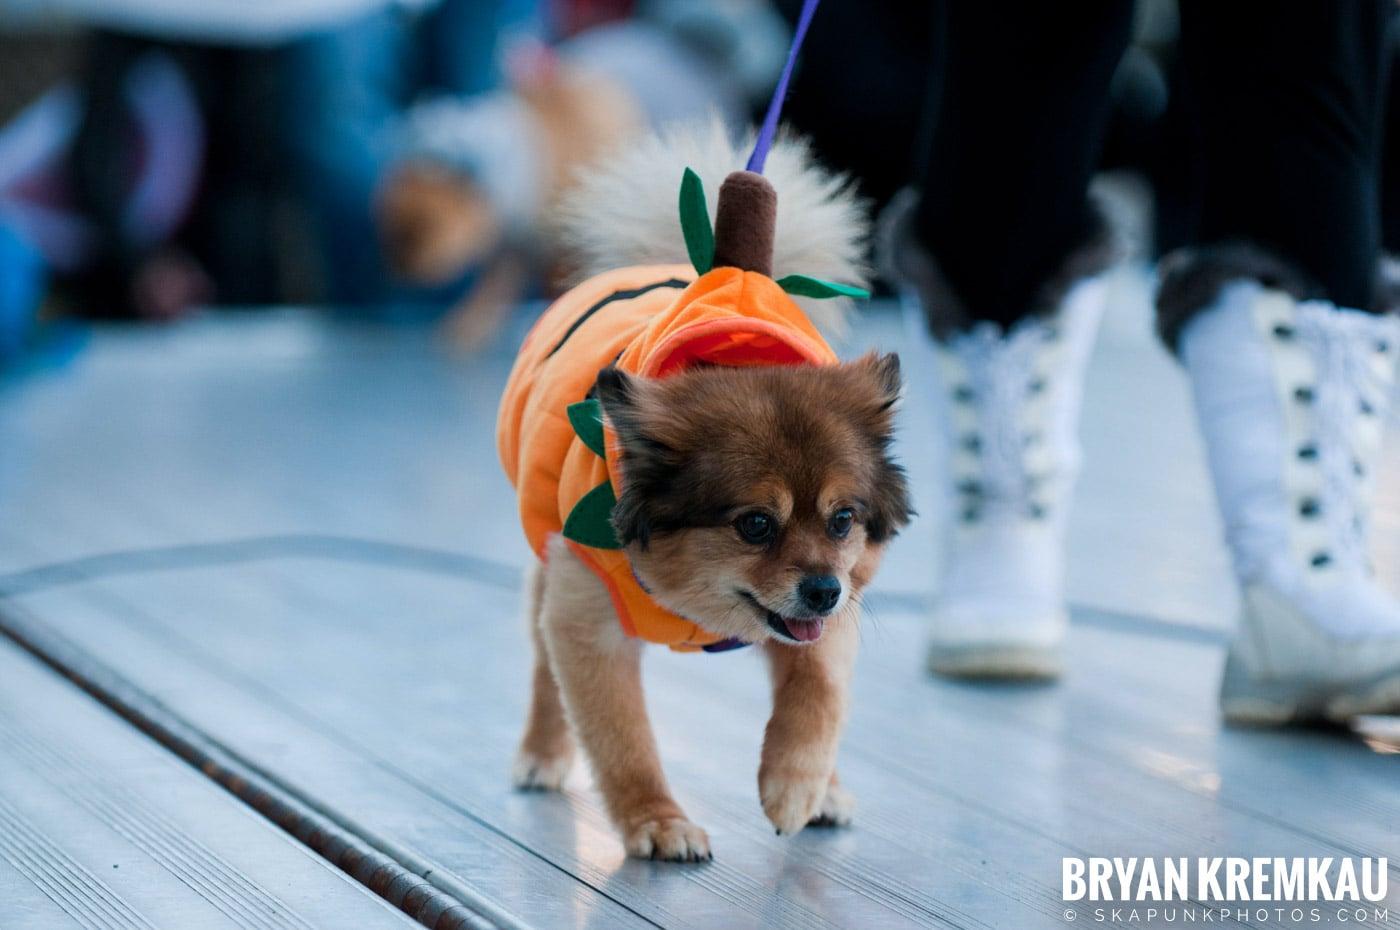 Paulus Hook Halloween Pet Parade 2011 @ Jersey City, NJ - 10.30.11 (22)